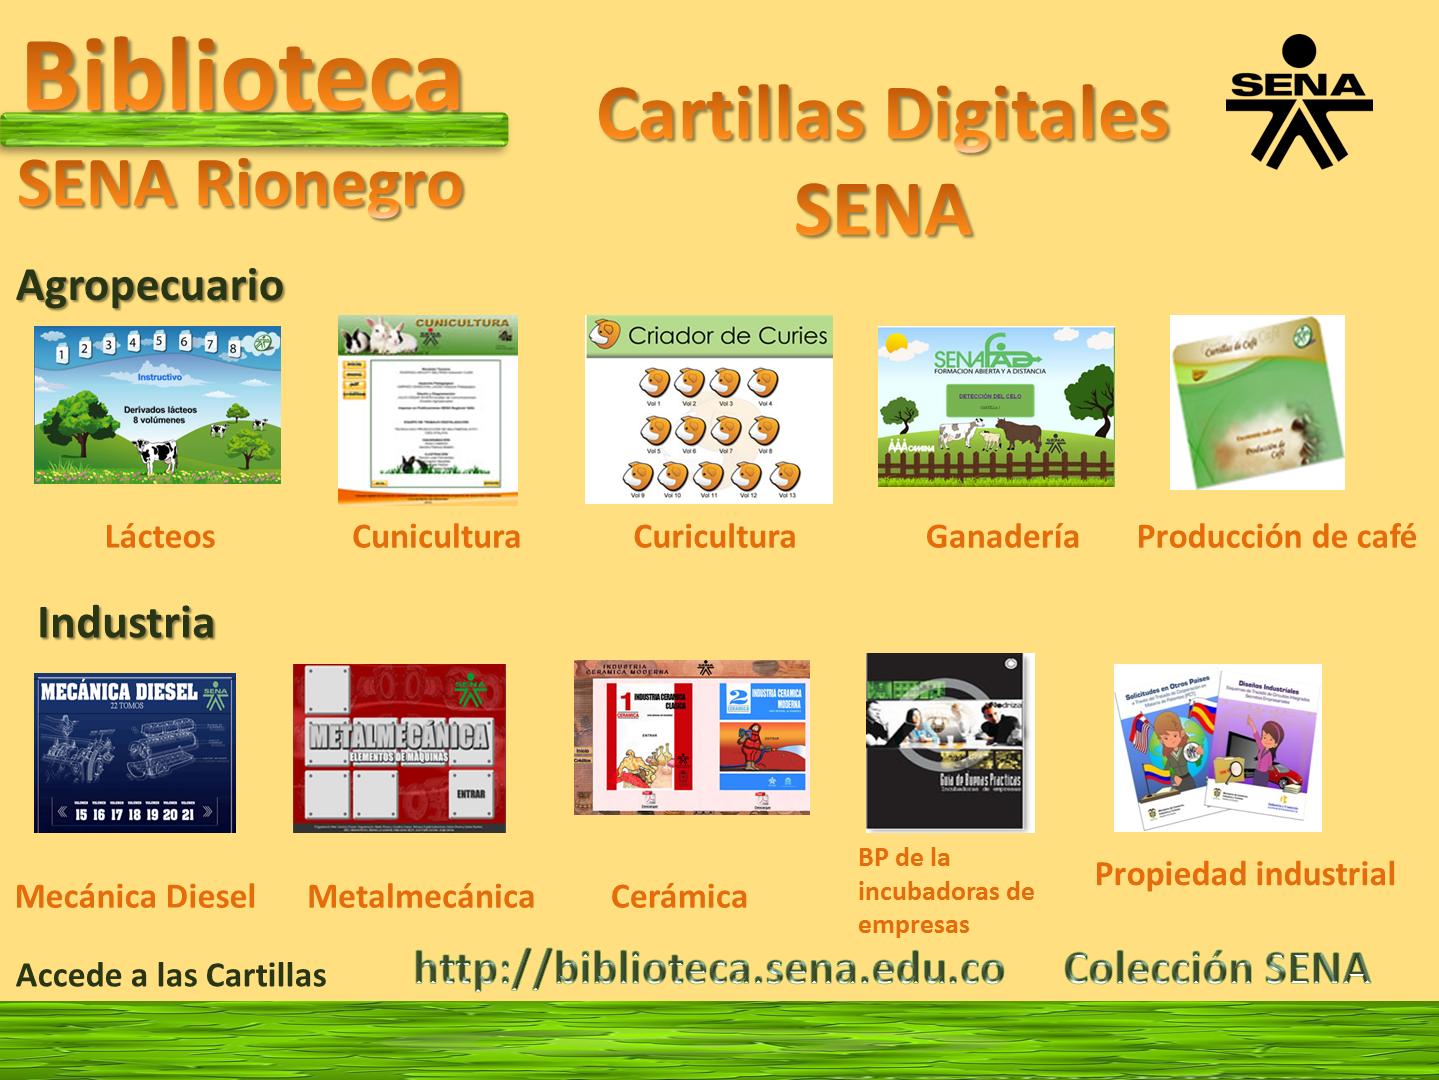 http://biblioteca.sena.edu.co/coleccion/1.html